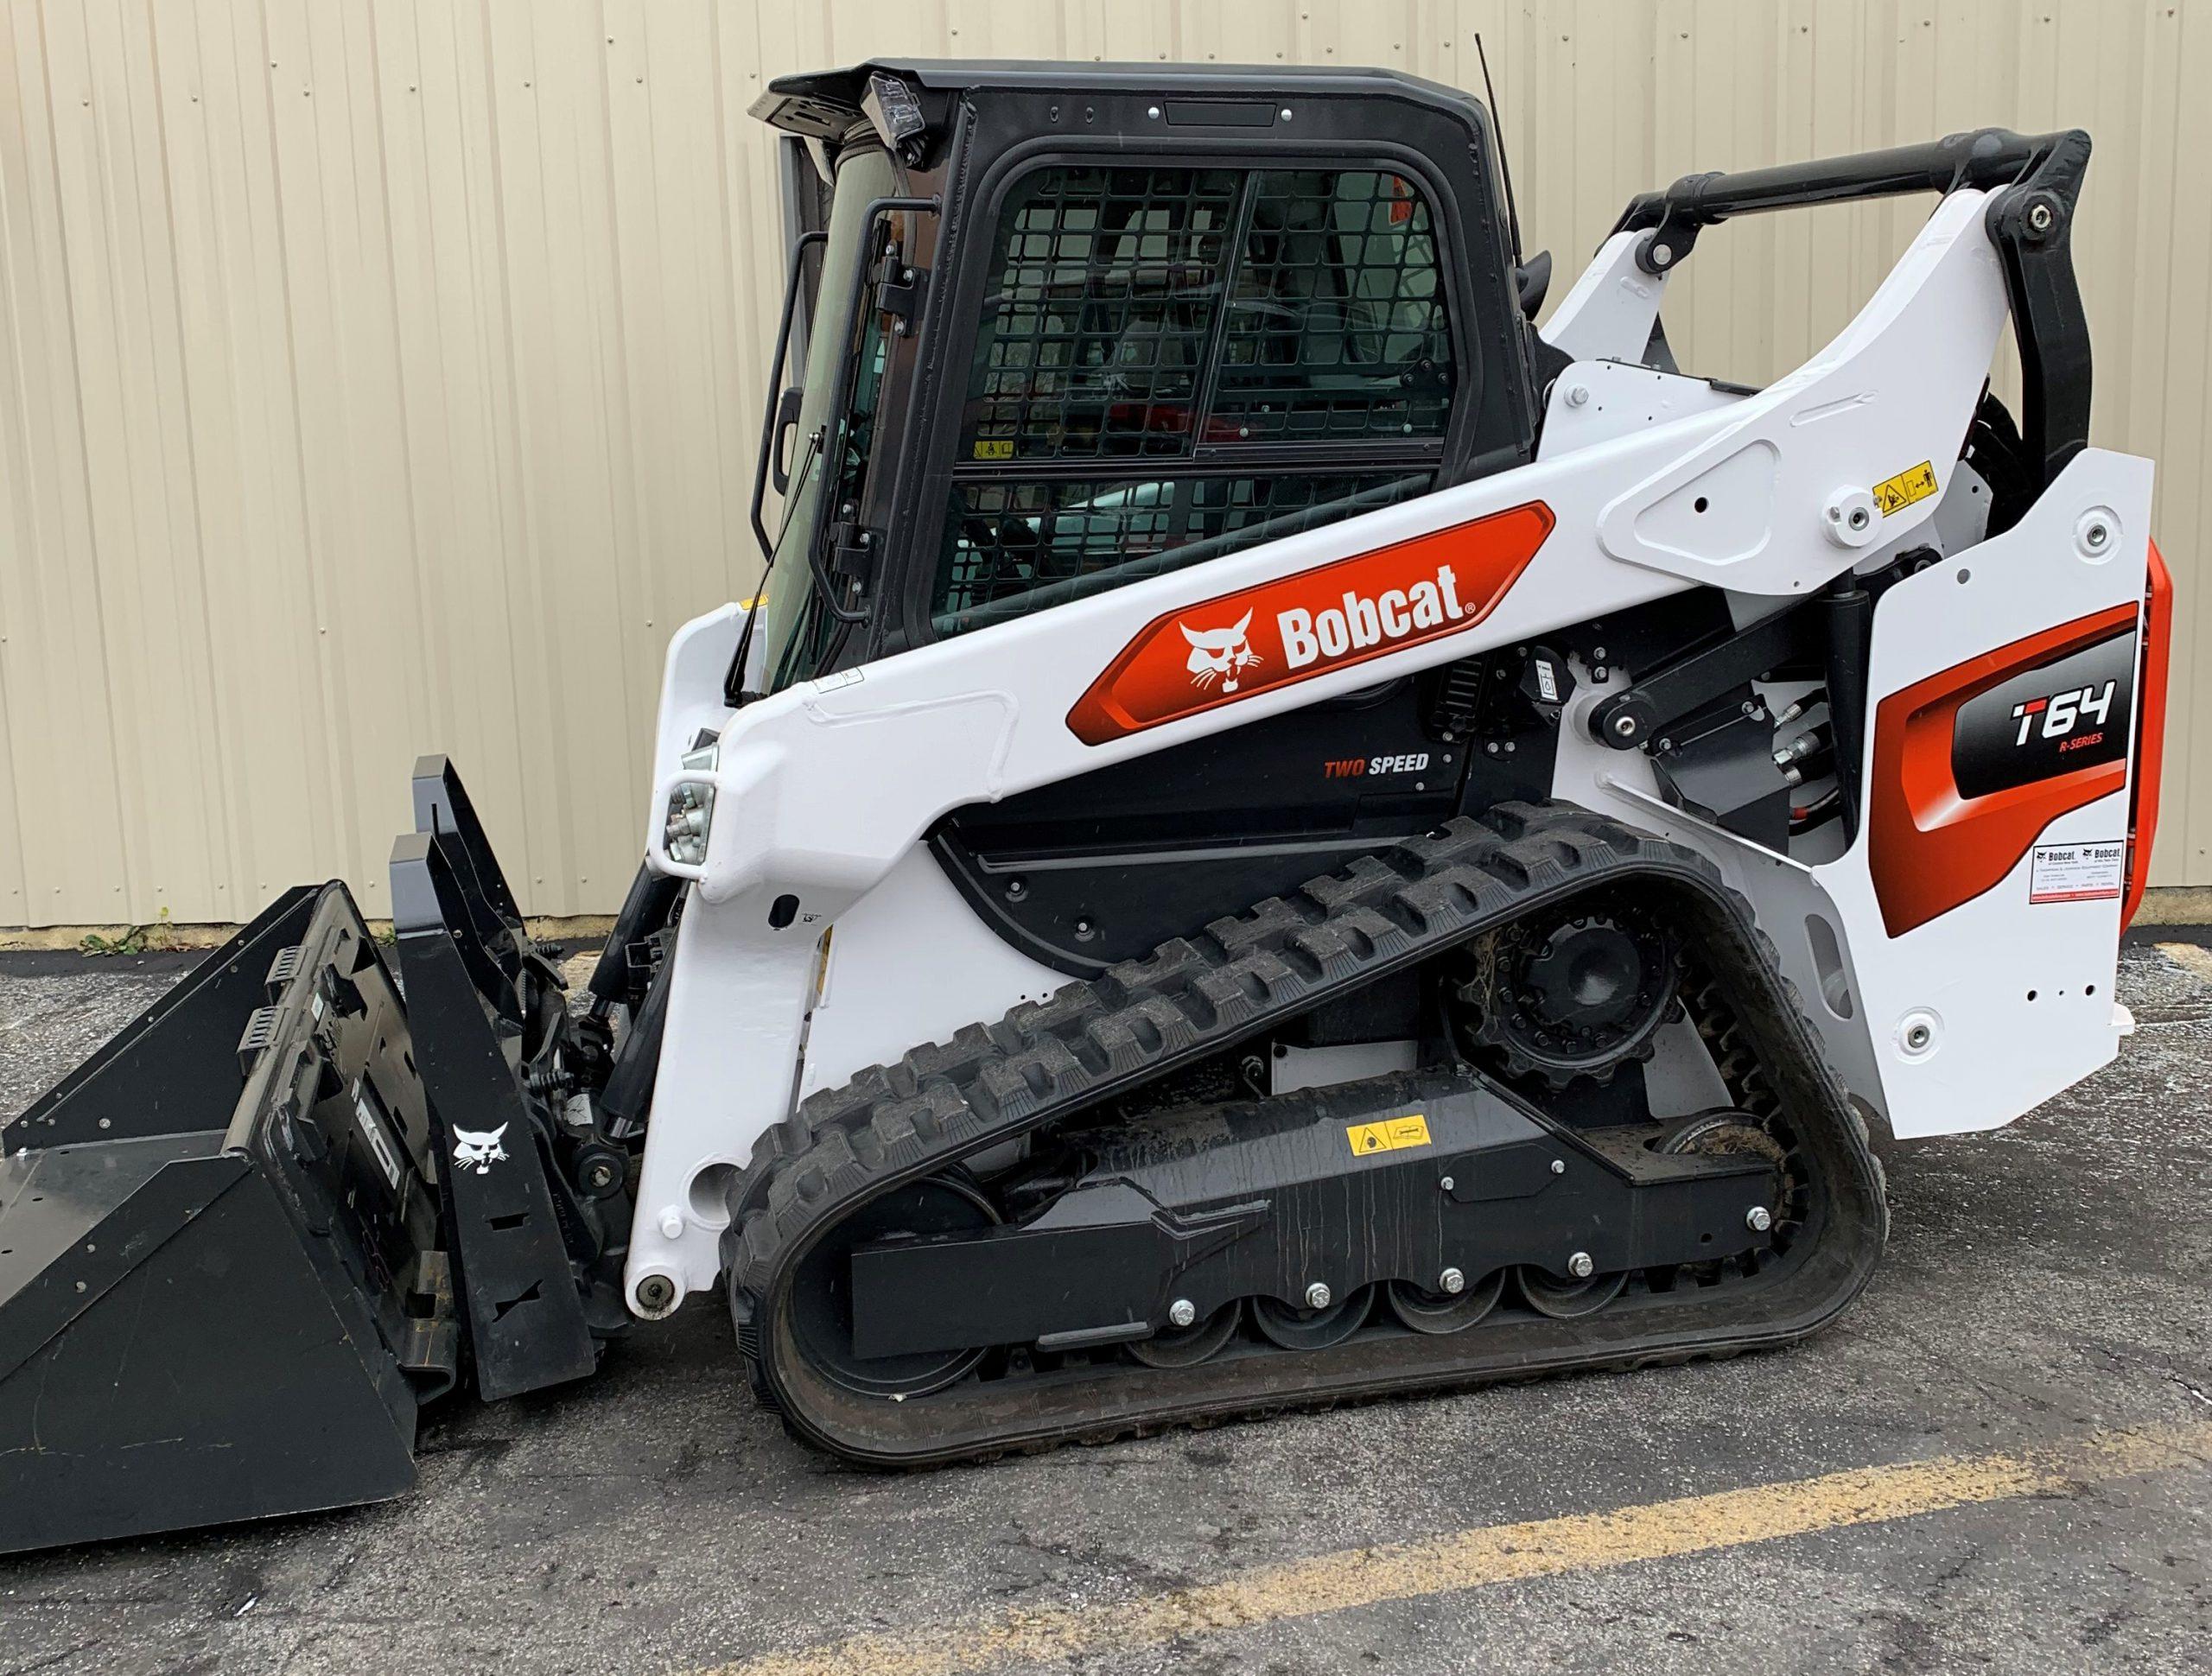 Bobcat - Ground Force